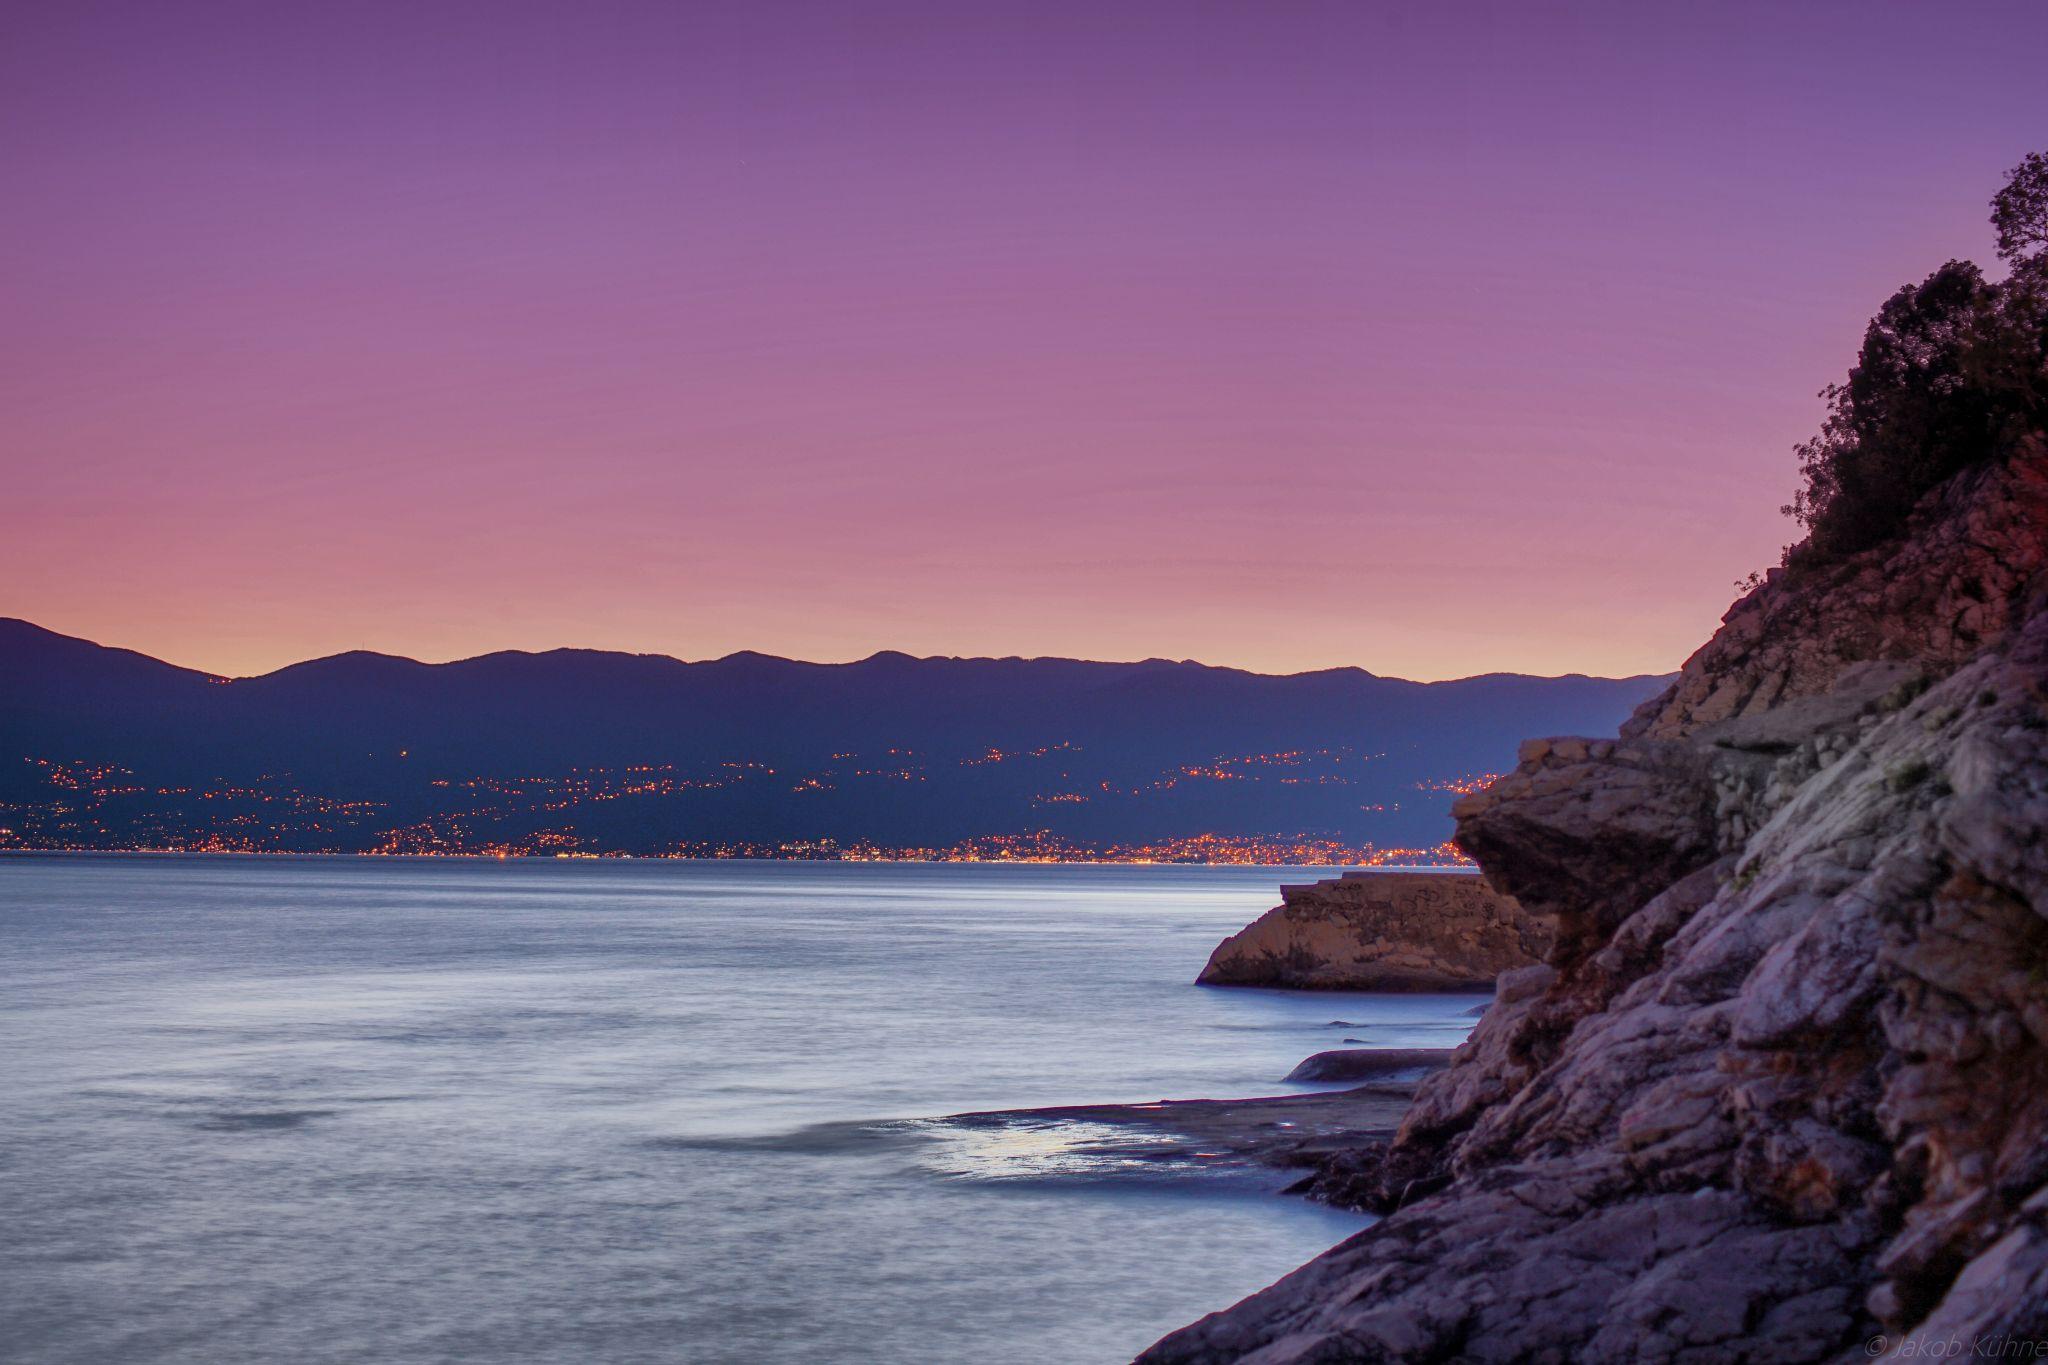 Coastline south of Rijeka, Croatia